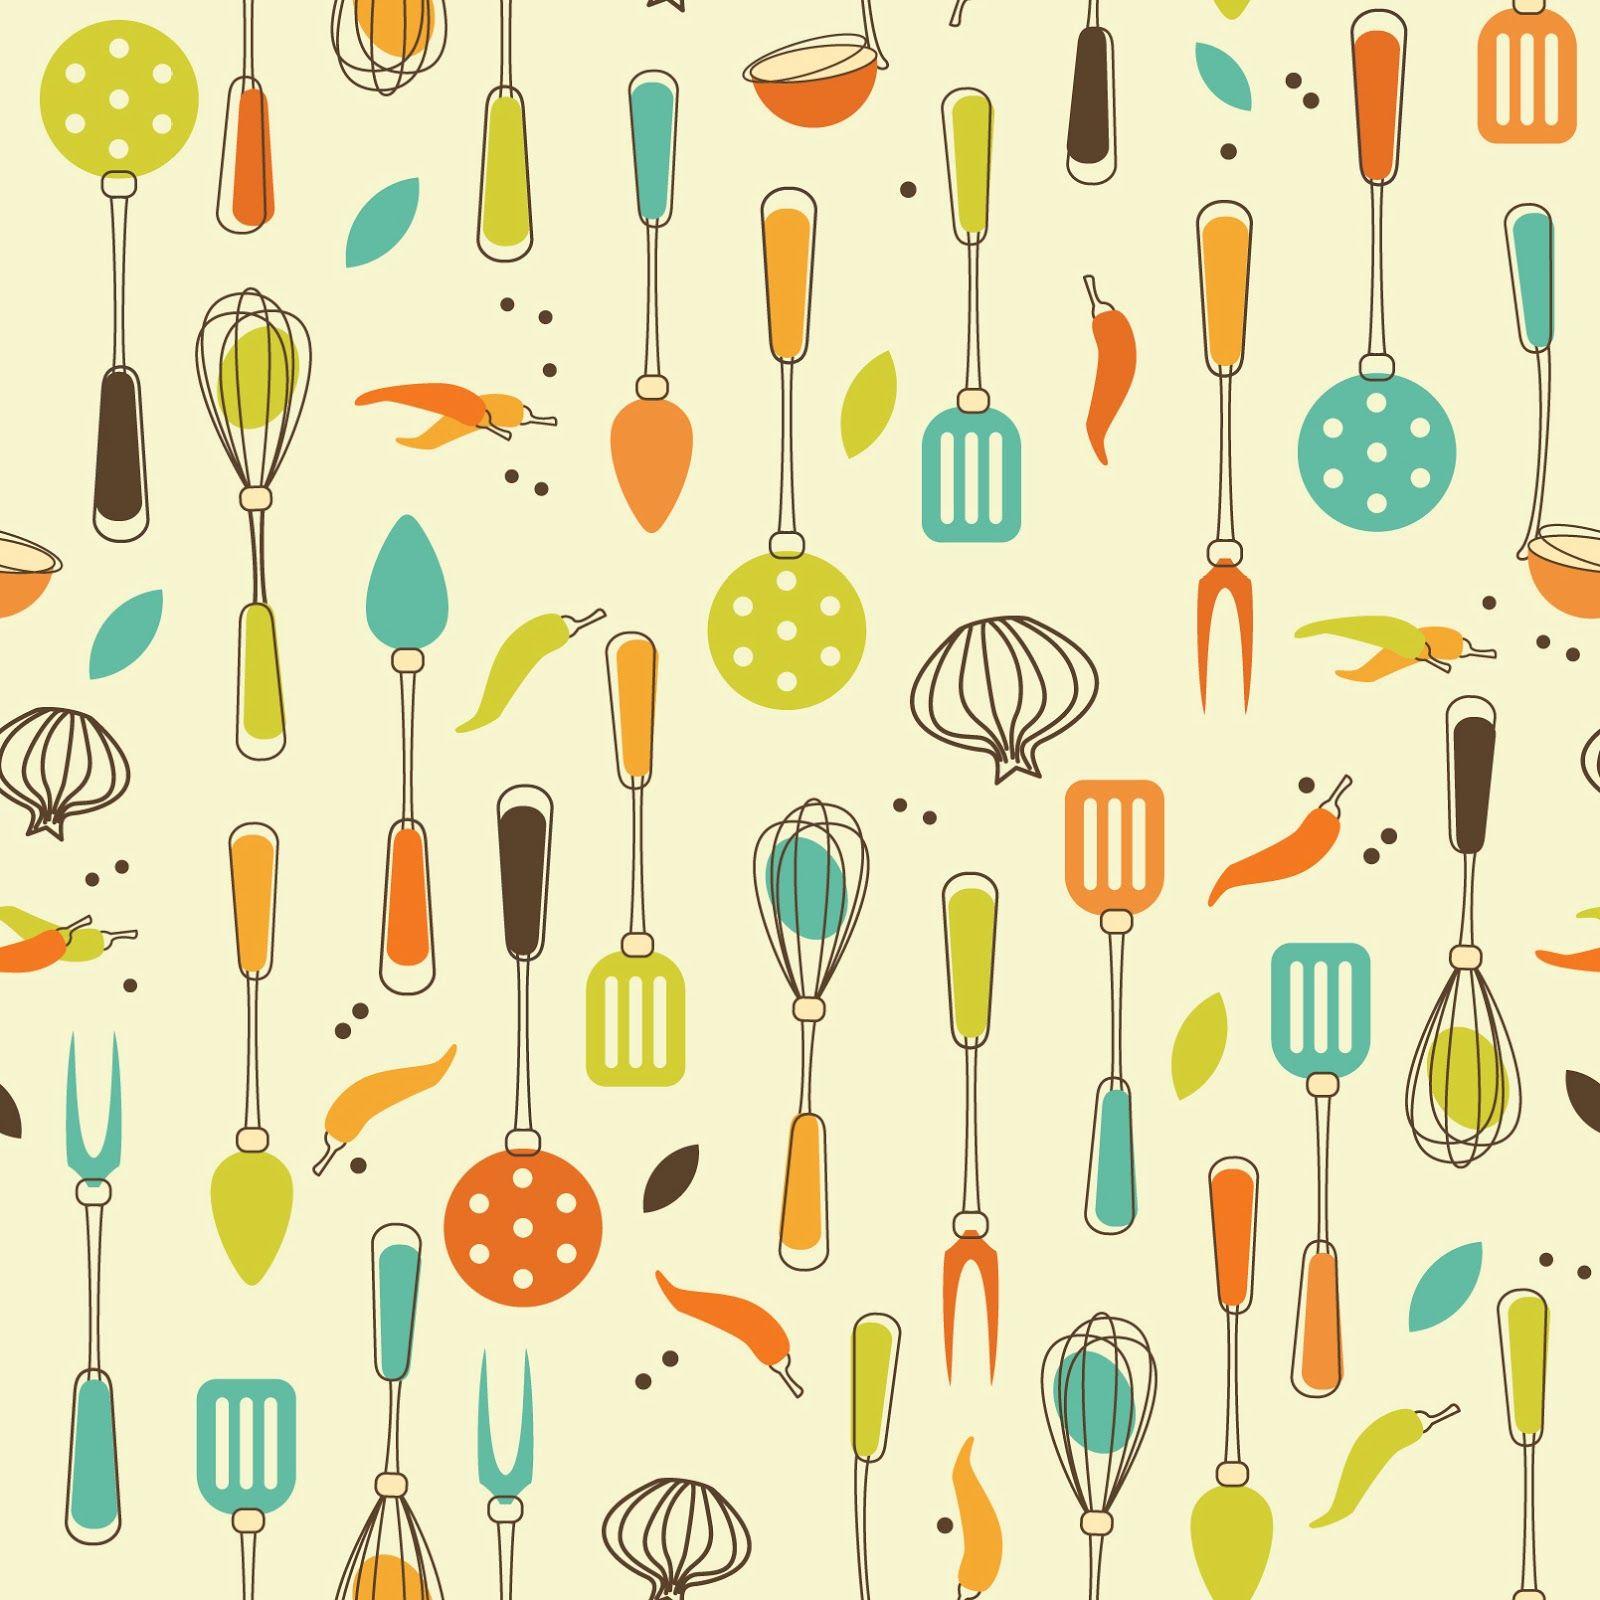 free kitchen clipart - Google Search | Graphics | Kitchen ...